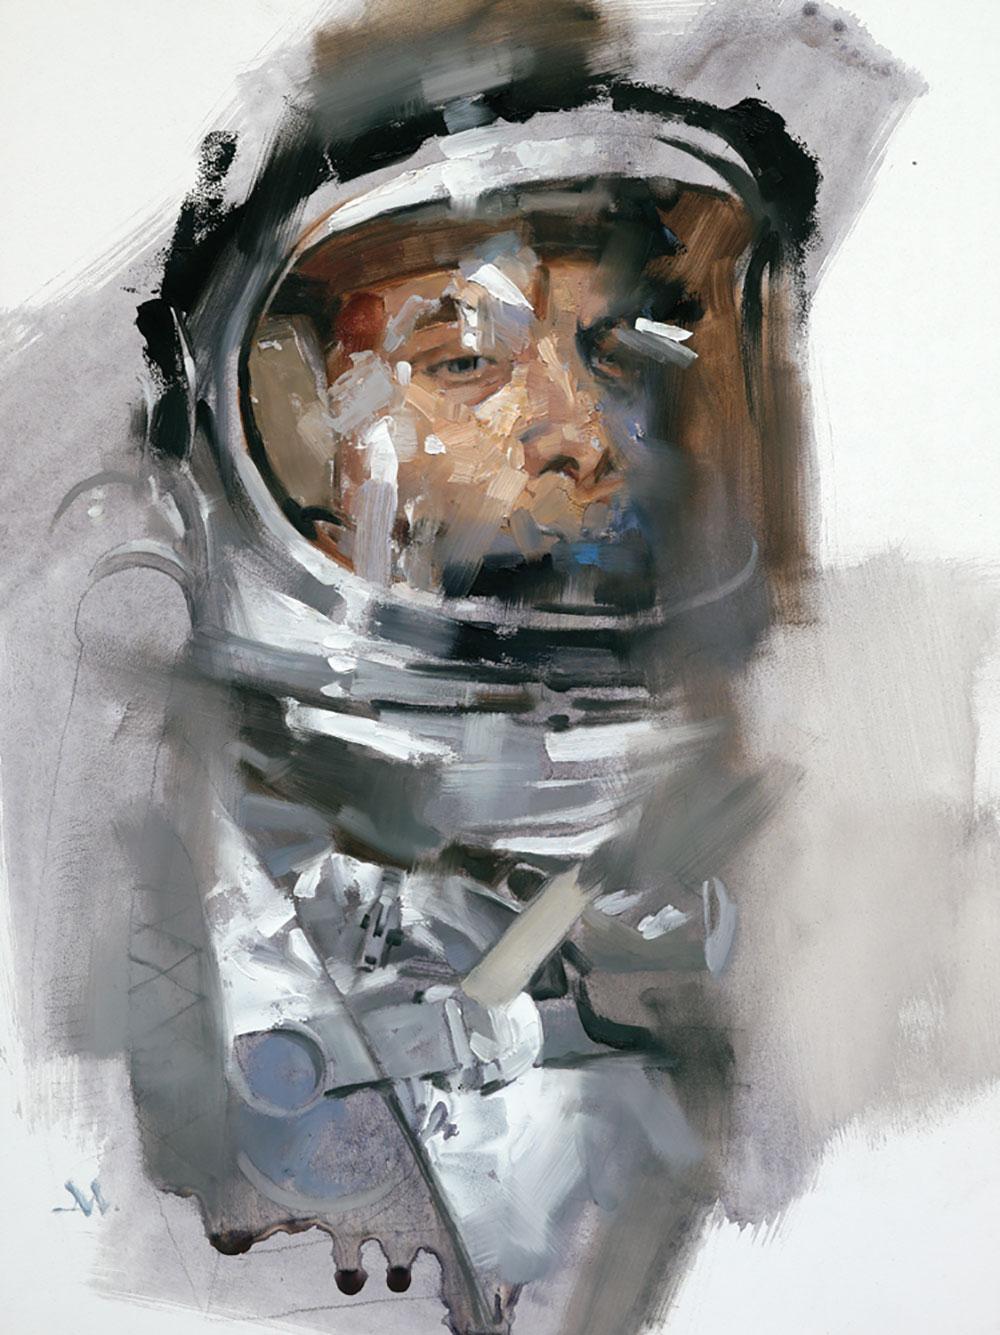 Richard Solomon - Gregory-Manchess-189-SF-Astronaut-2